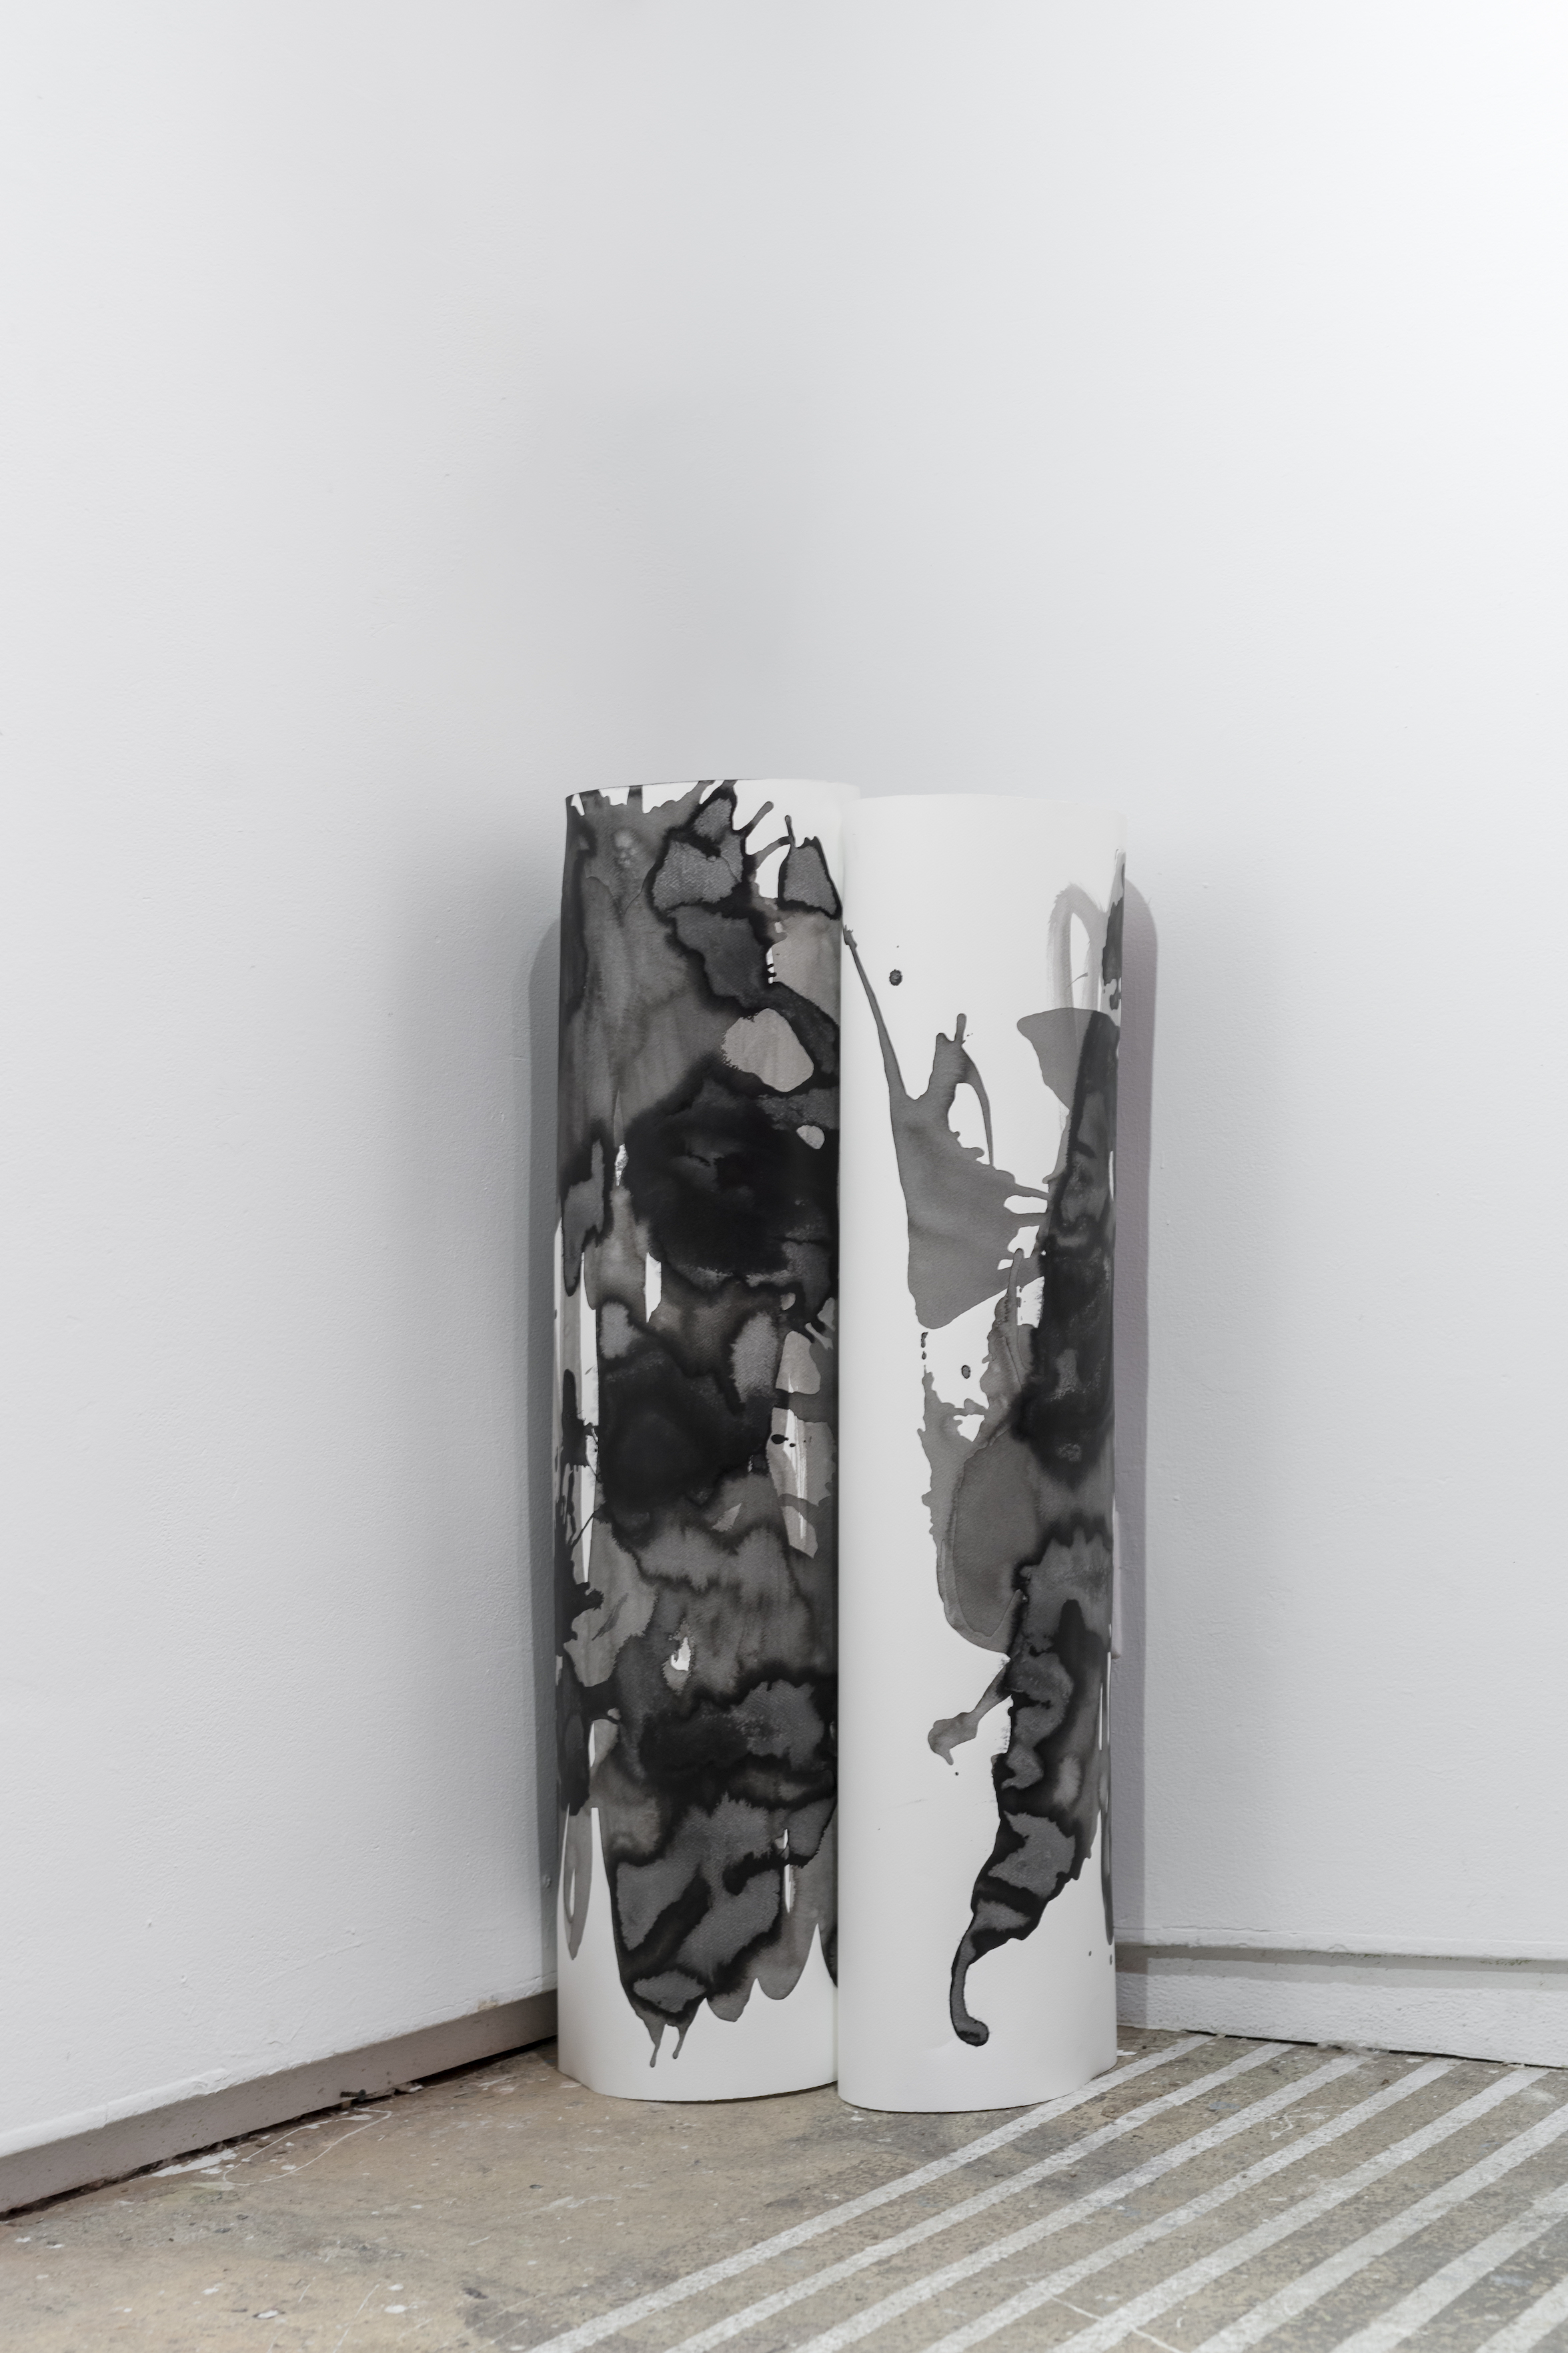 Margrethe Aanestad    Untitled,  2016   Ink on aquarelle paper   Object, dimensions variable